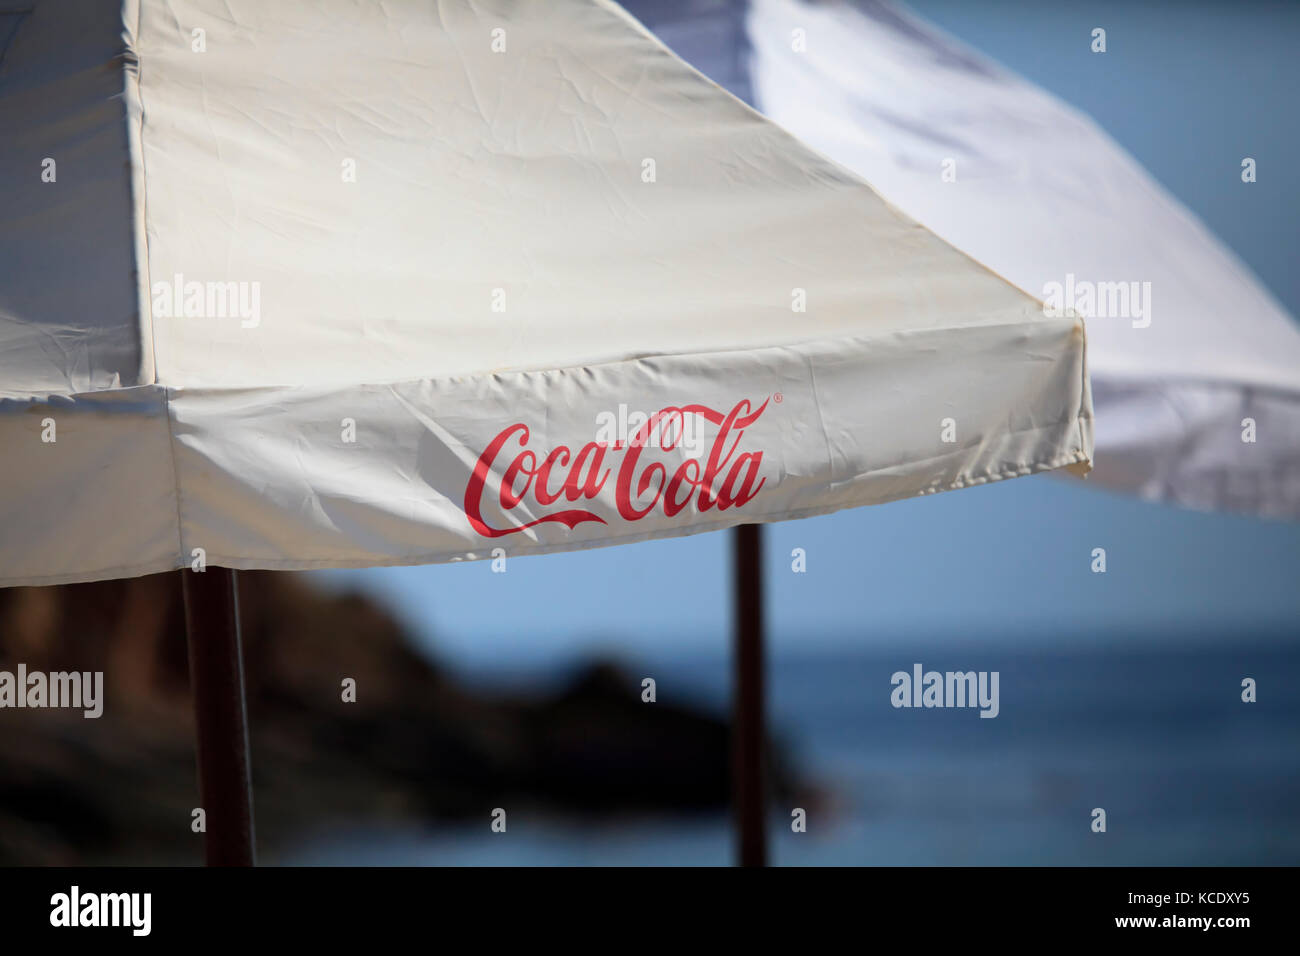 SOFIA, BULGARIA - SEPTEMBER 24, 2017: Coca-Cola text on umbrela near sea beach. Coca-cola is the world's most selling Stock Photo